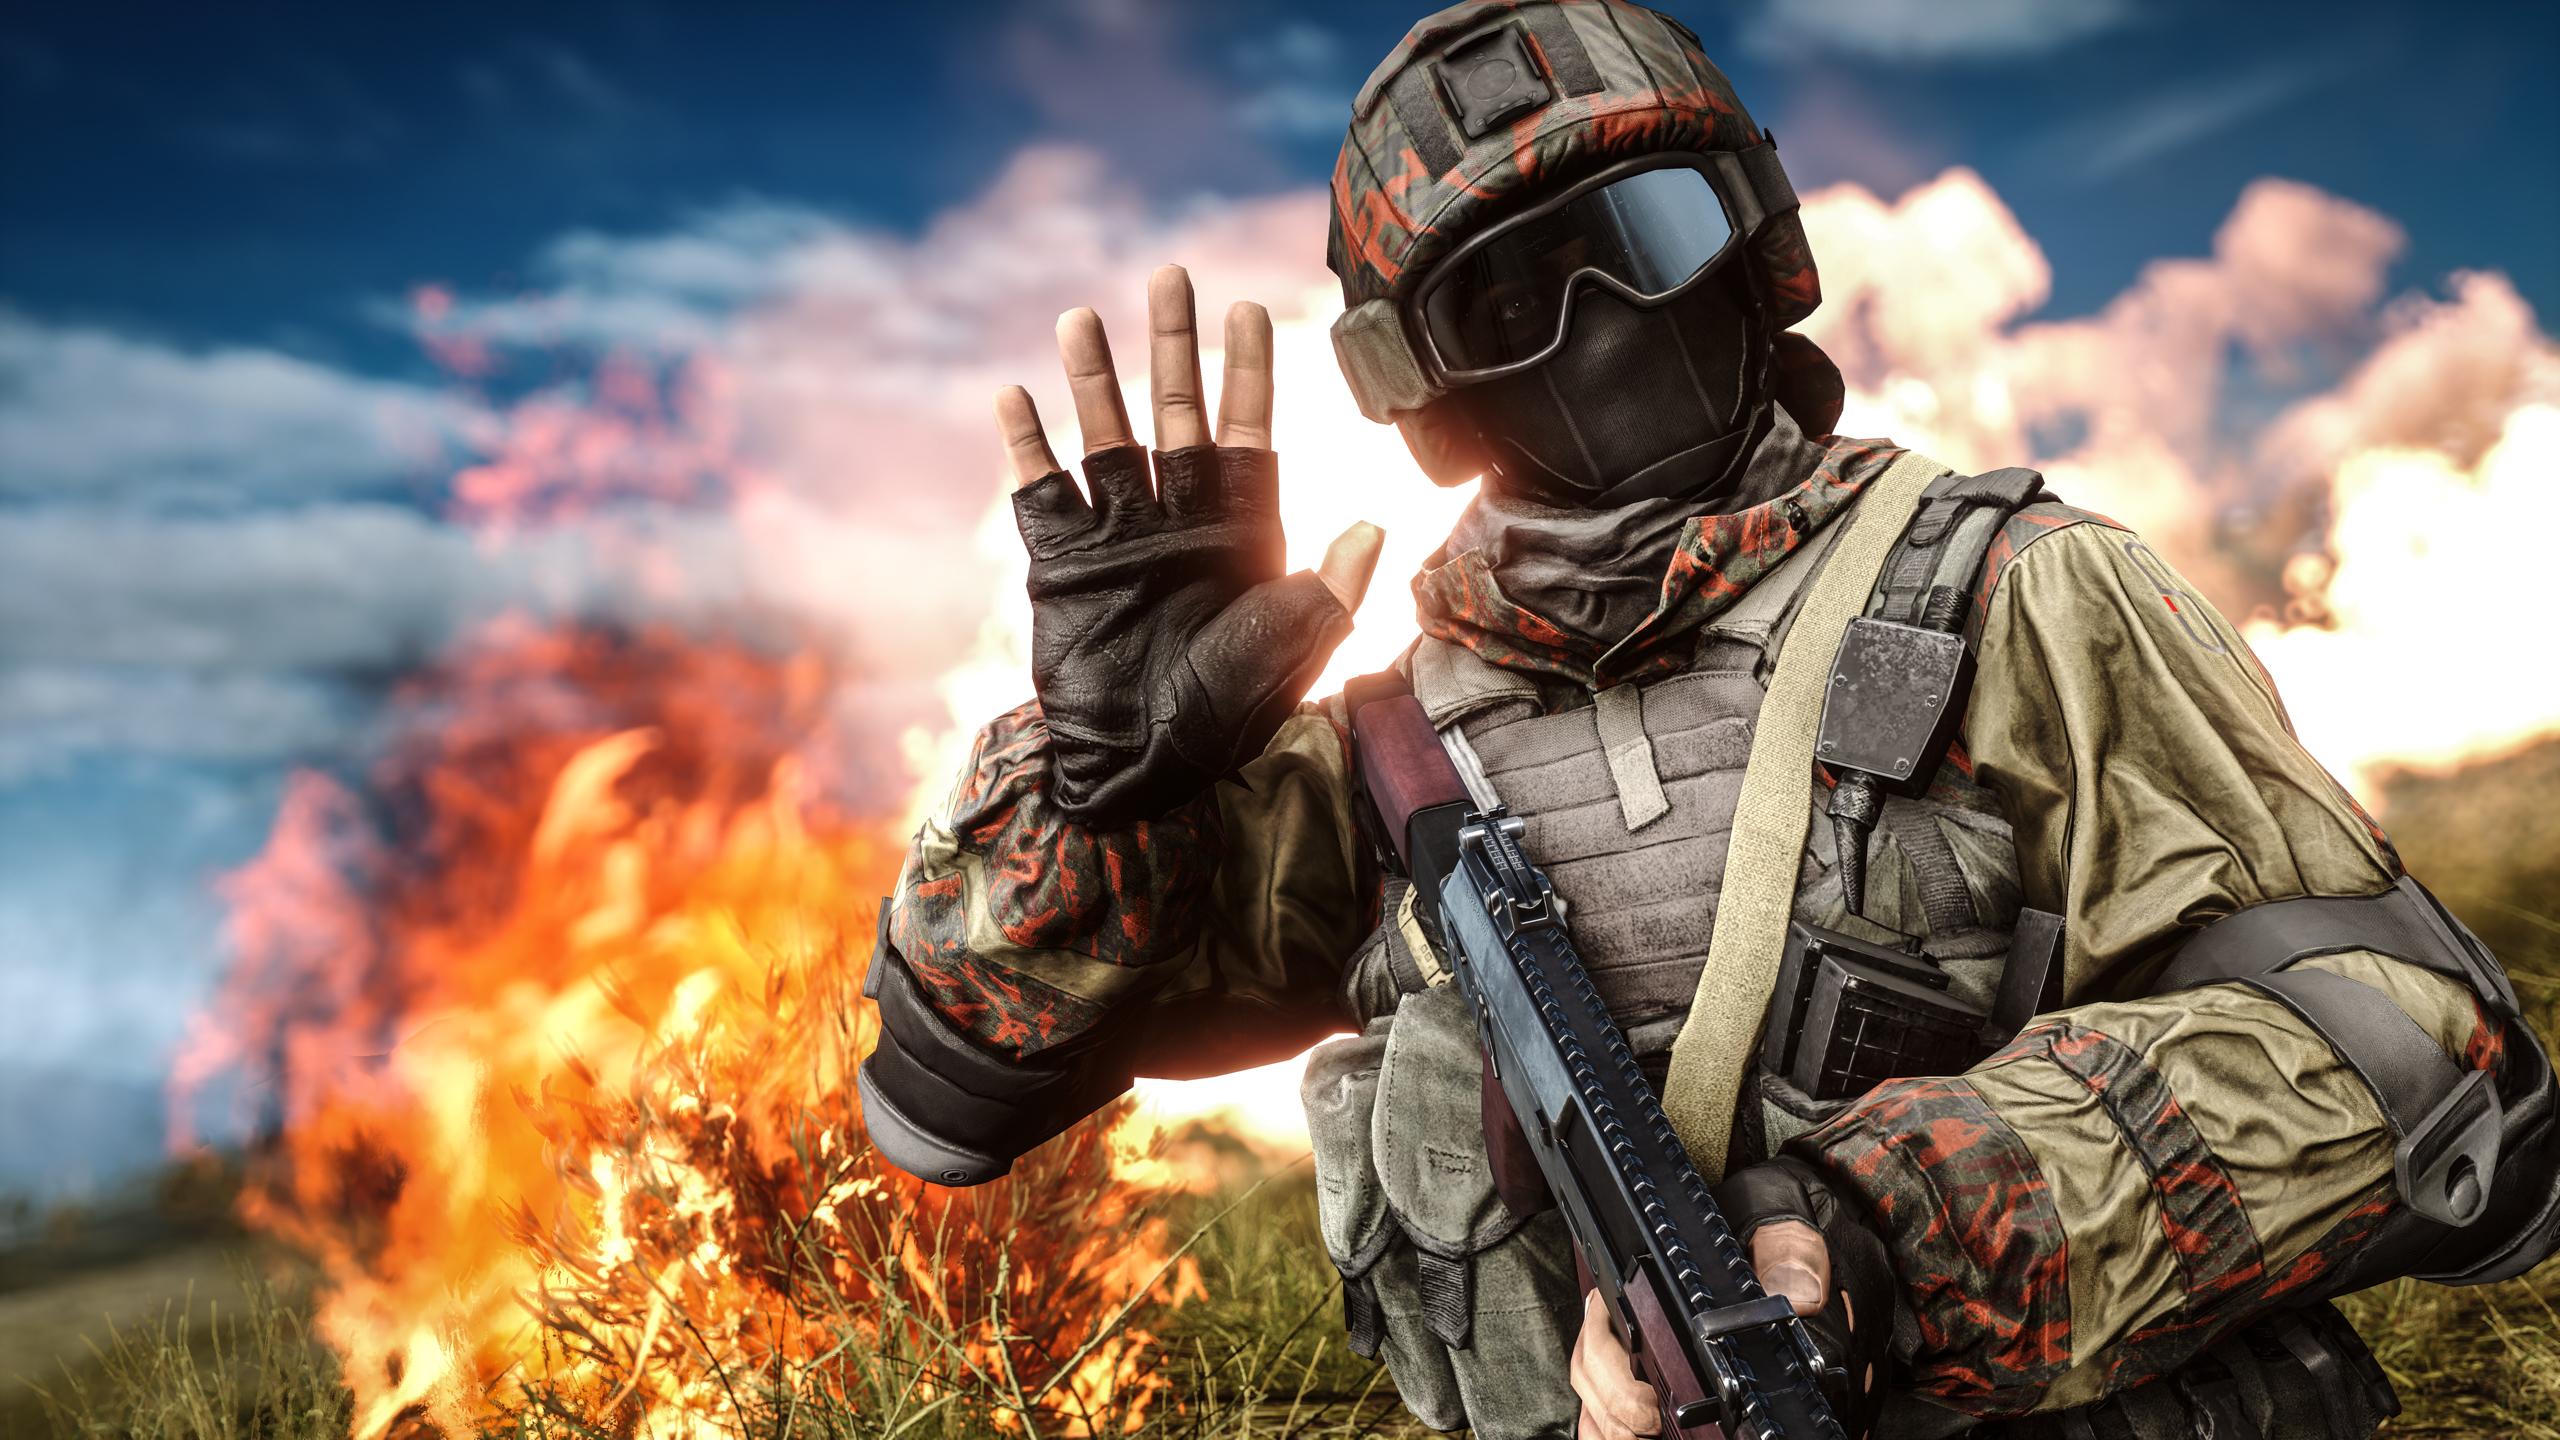 Обои battlefield 4, солдат, экипировка, шлем ...: https://www.goodfon.ru/wallpaper/battlefield-4-soldat-5690.html